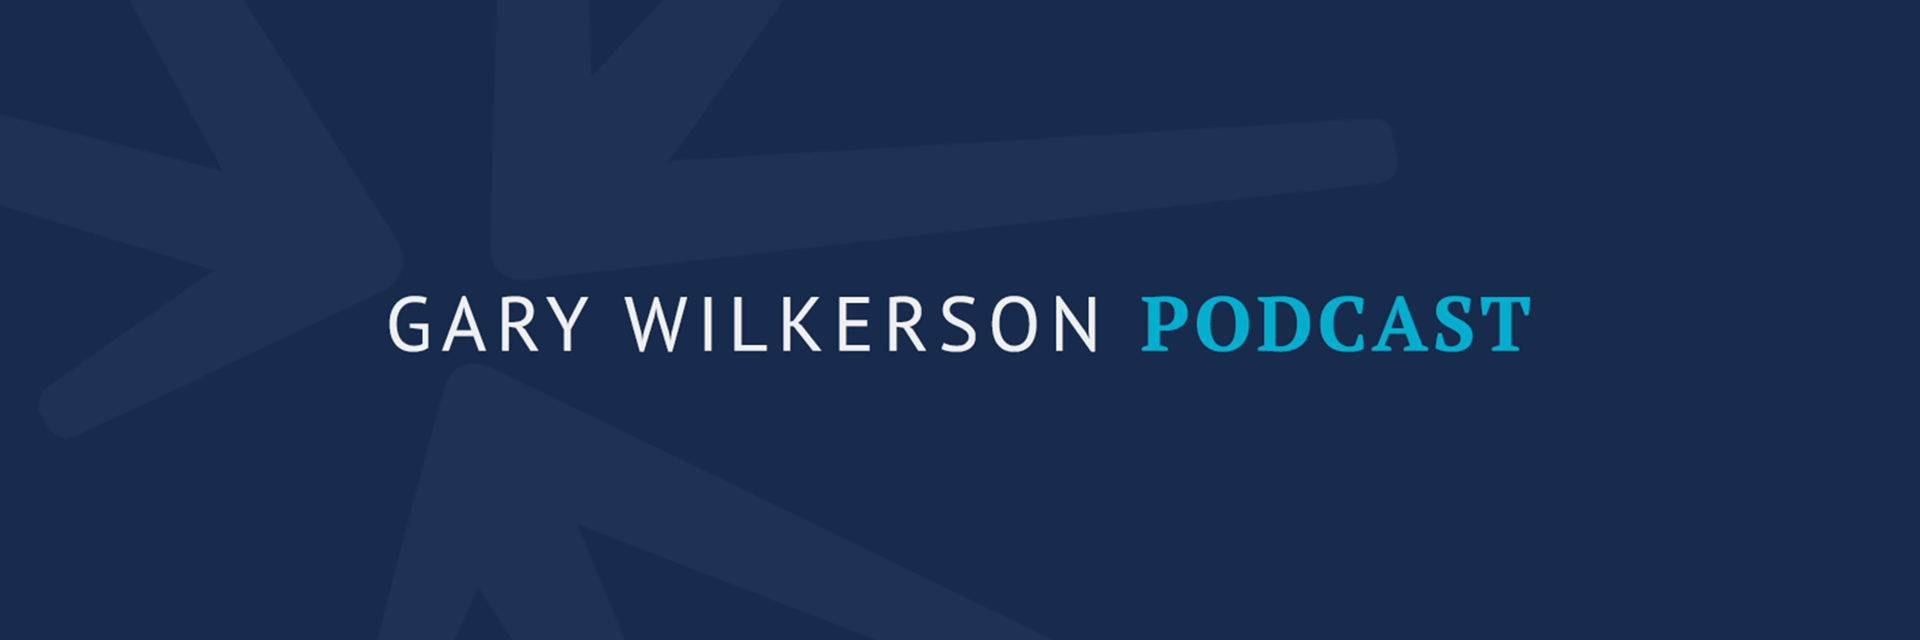 Gary Wilkerson Podcast header